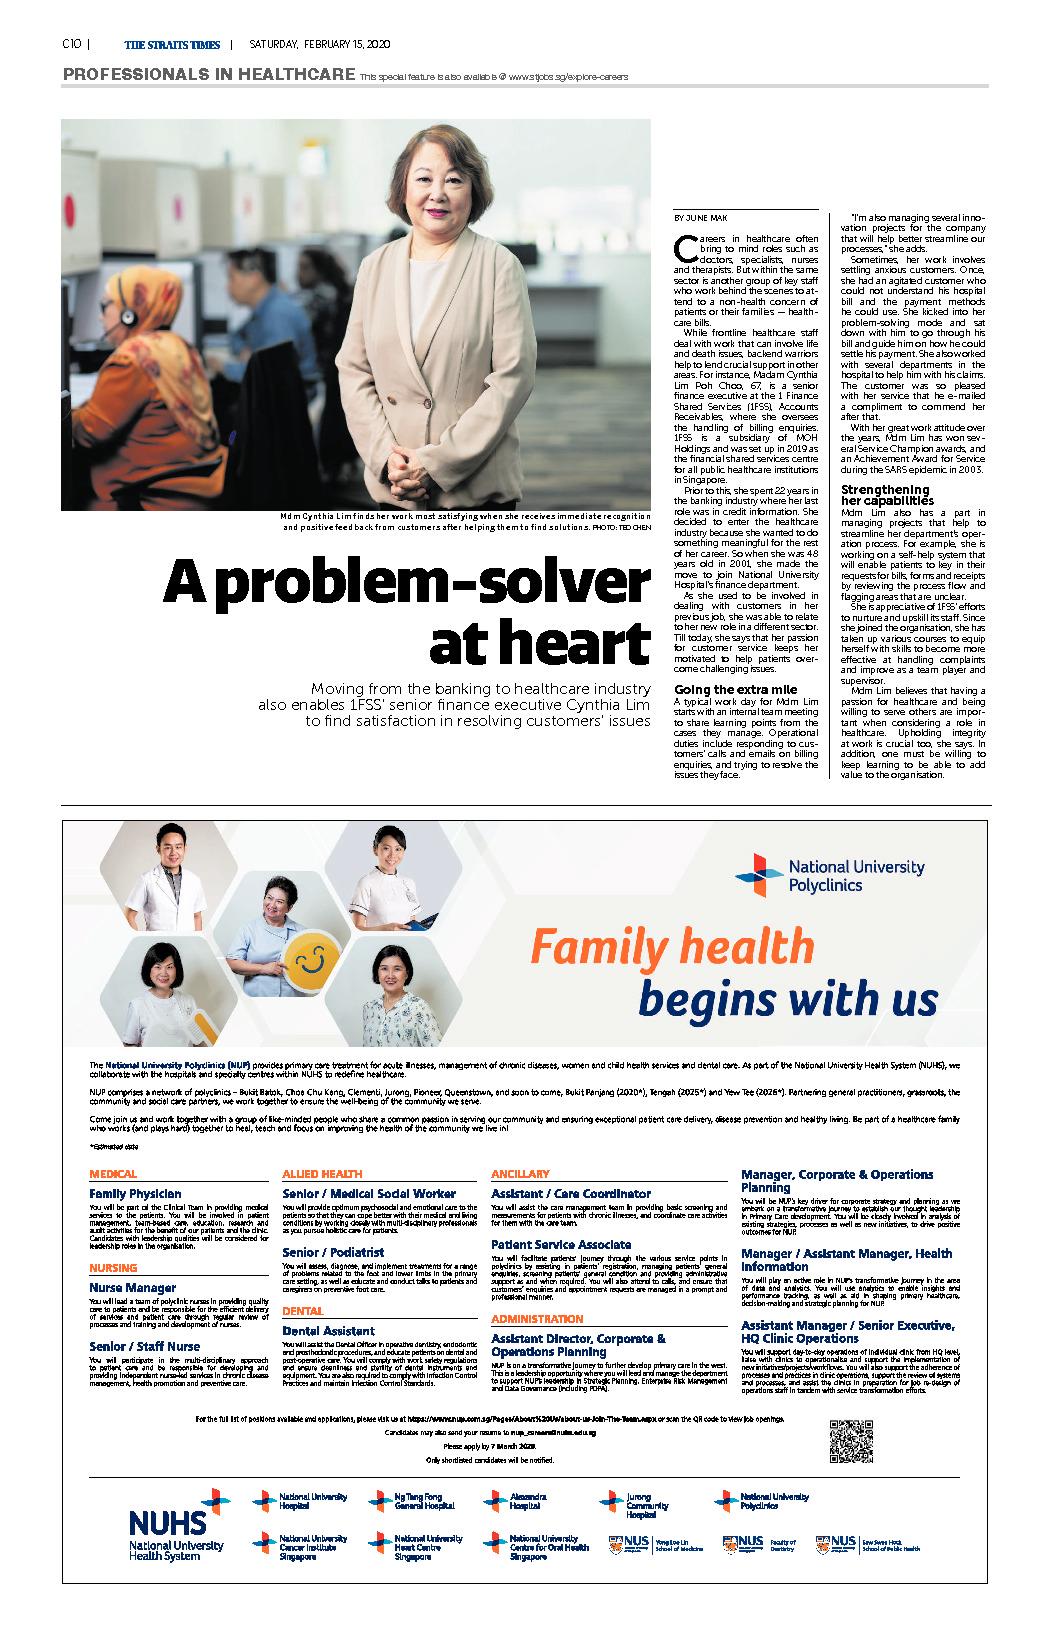 A problem-solver at heart